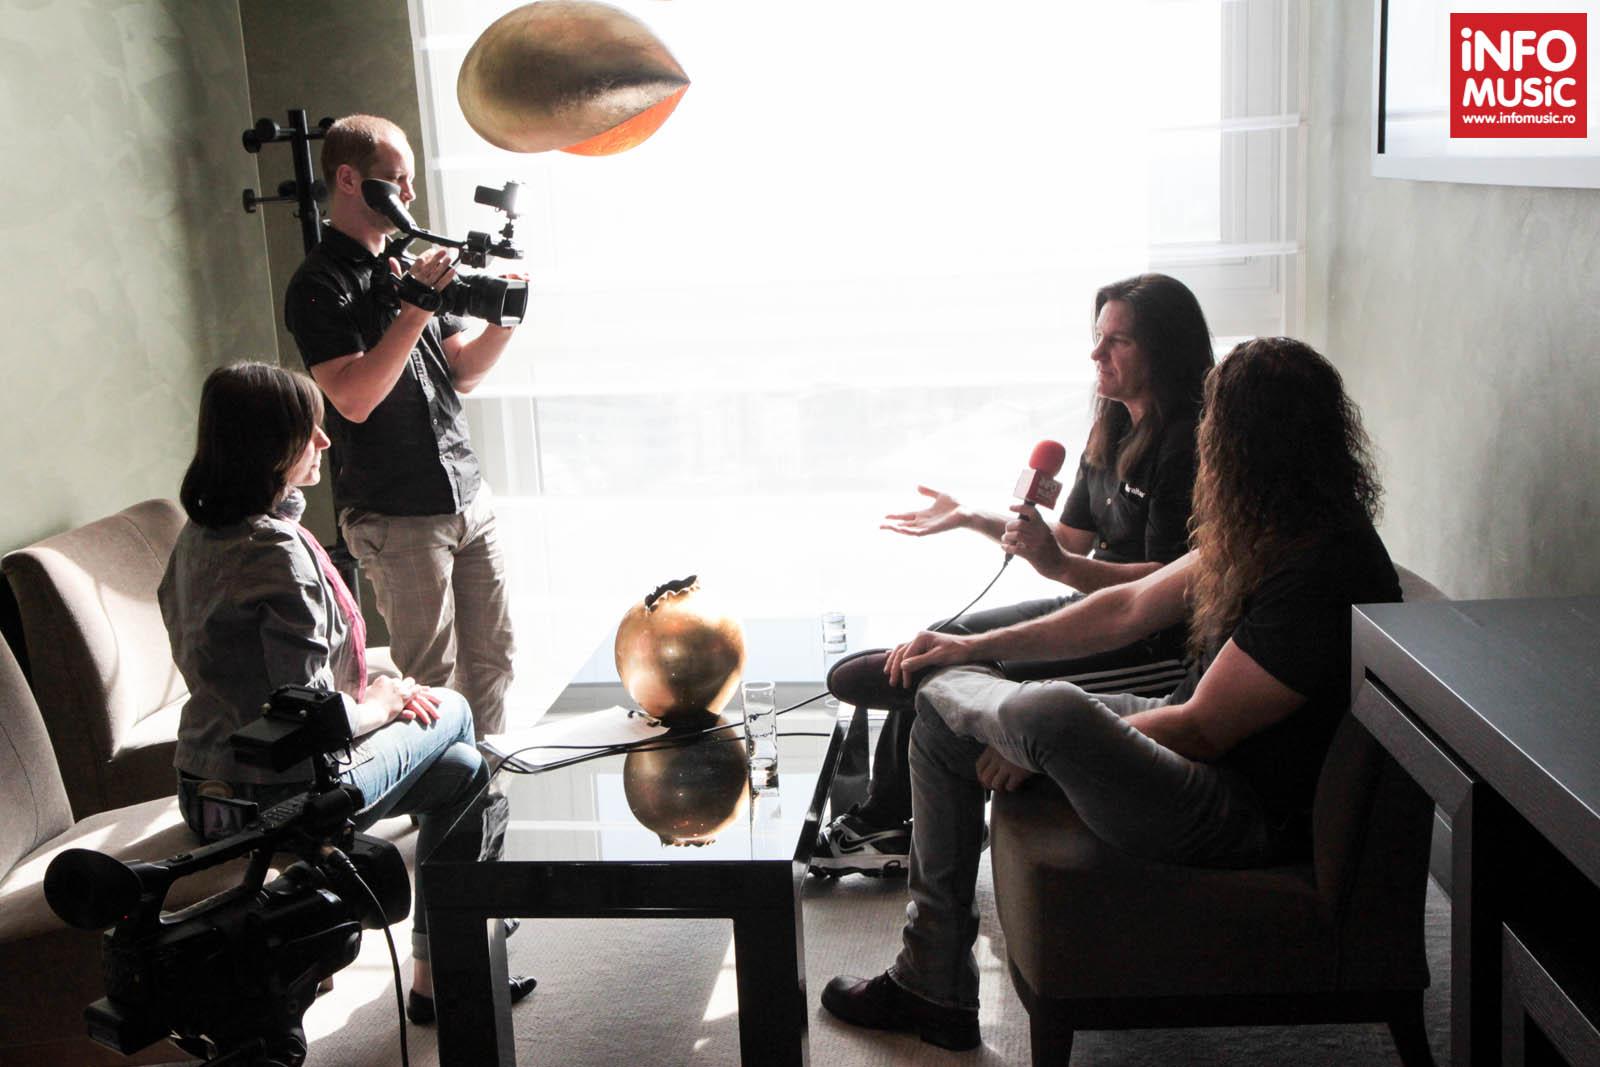 Shawn Drover și Chris Broderick (MEGADETH) intervievați de InfoMusic.ro